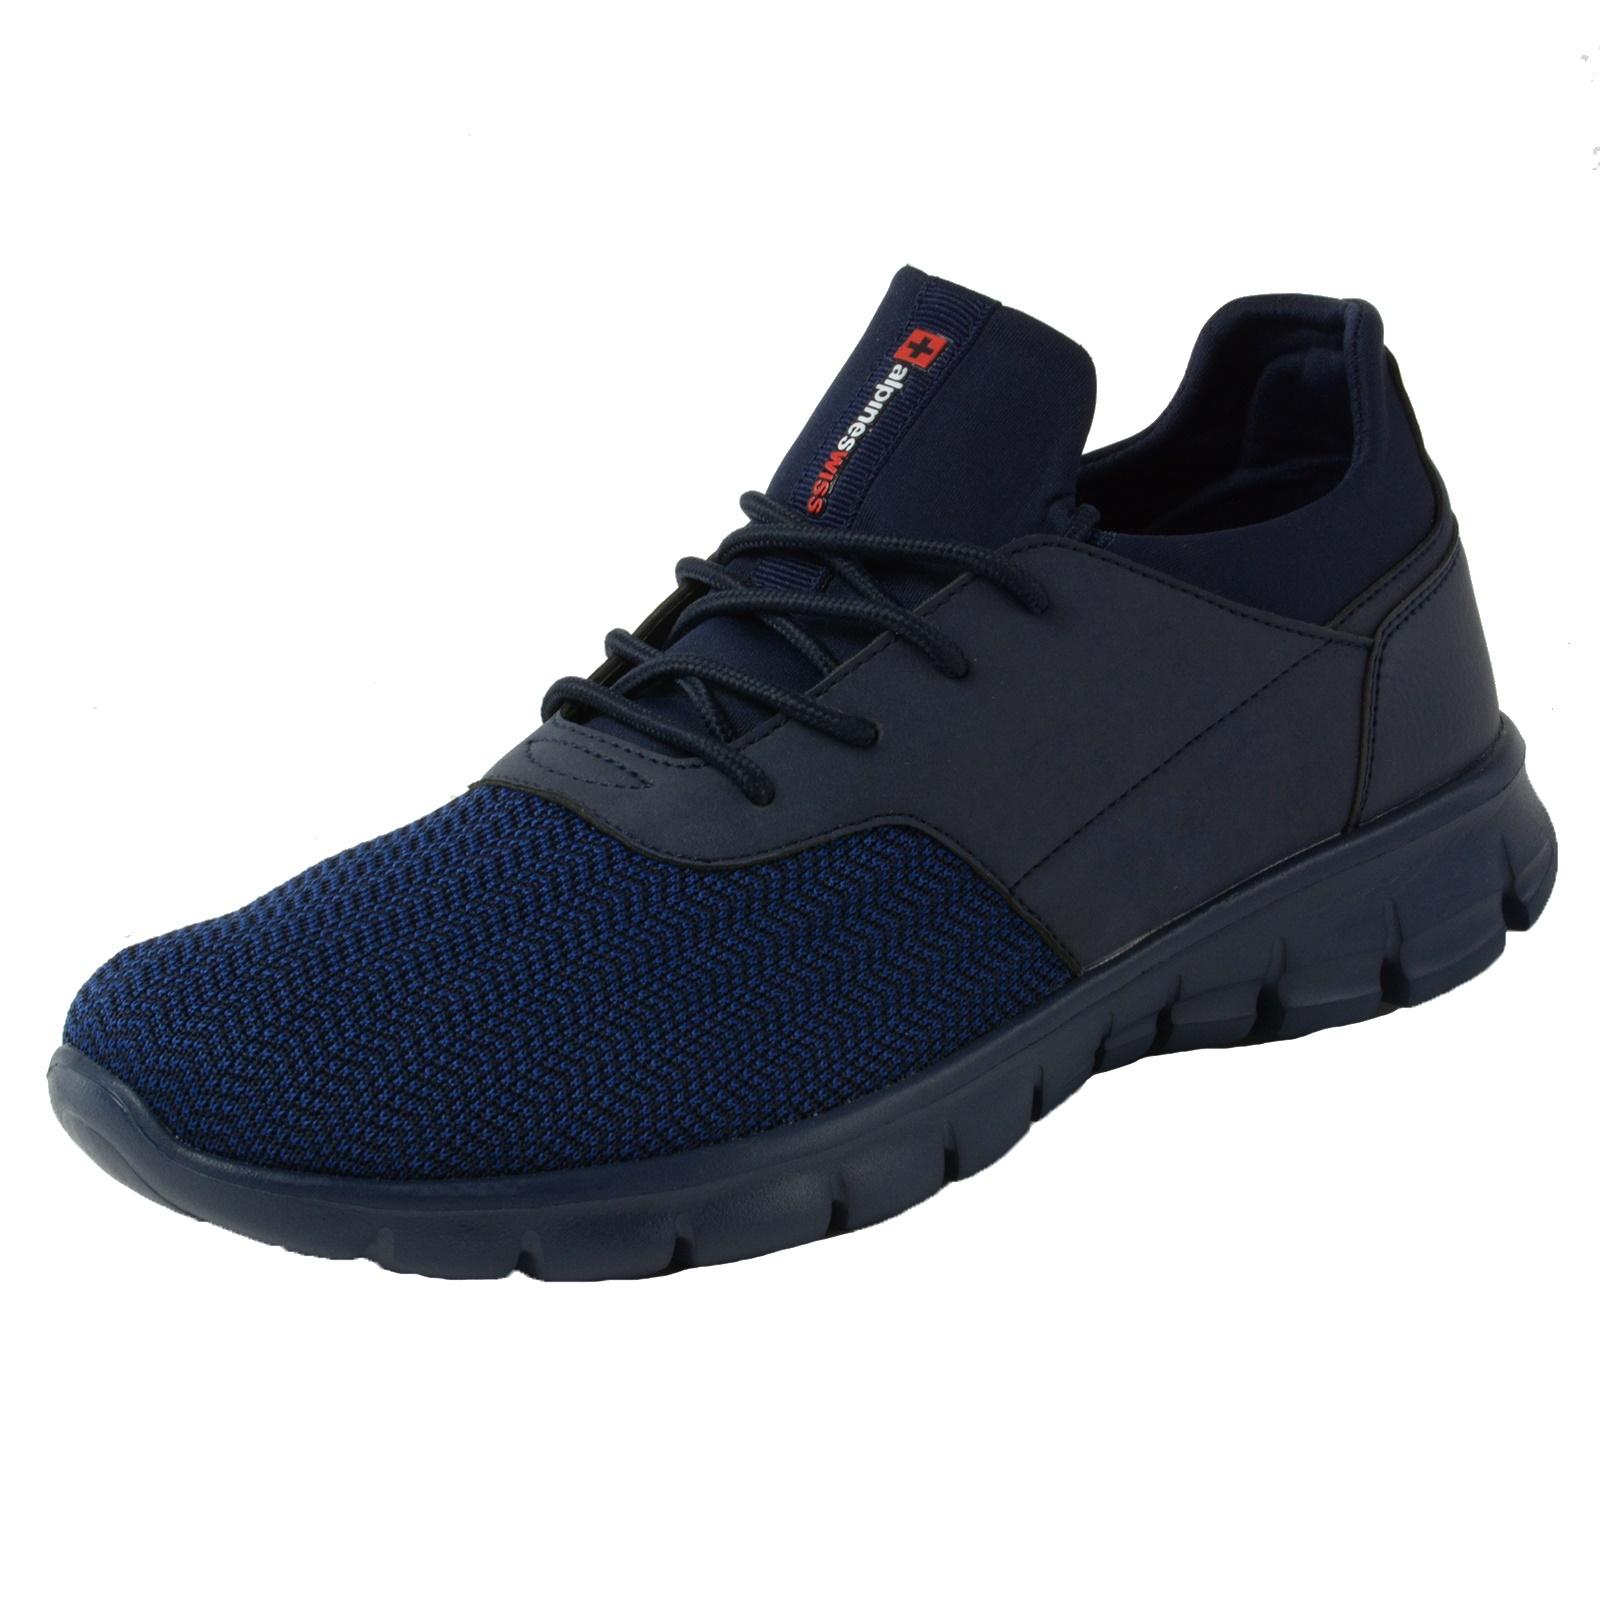 Alpine-Swiss-Leo-Men-Sneakers-Flex-Knit-Tennis-Shoes-Casual-Athletic-Lightweight